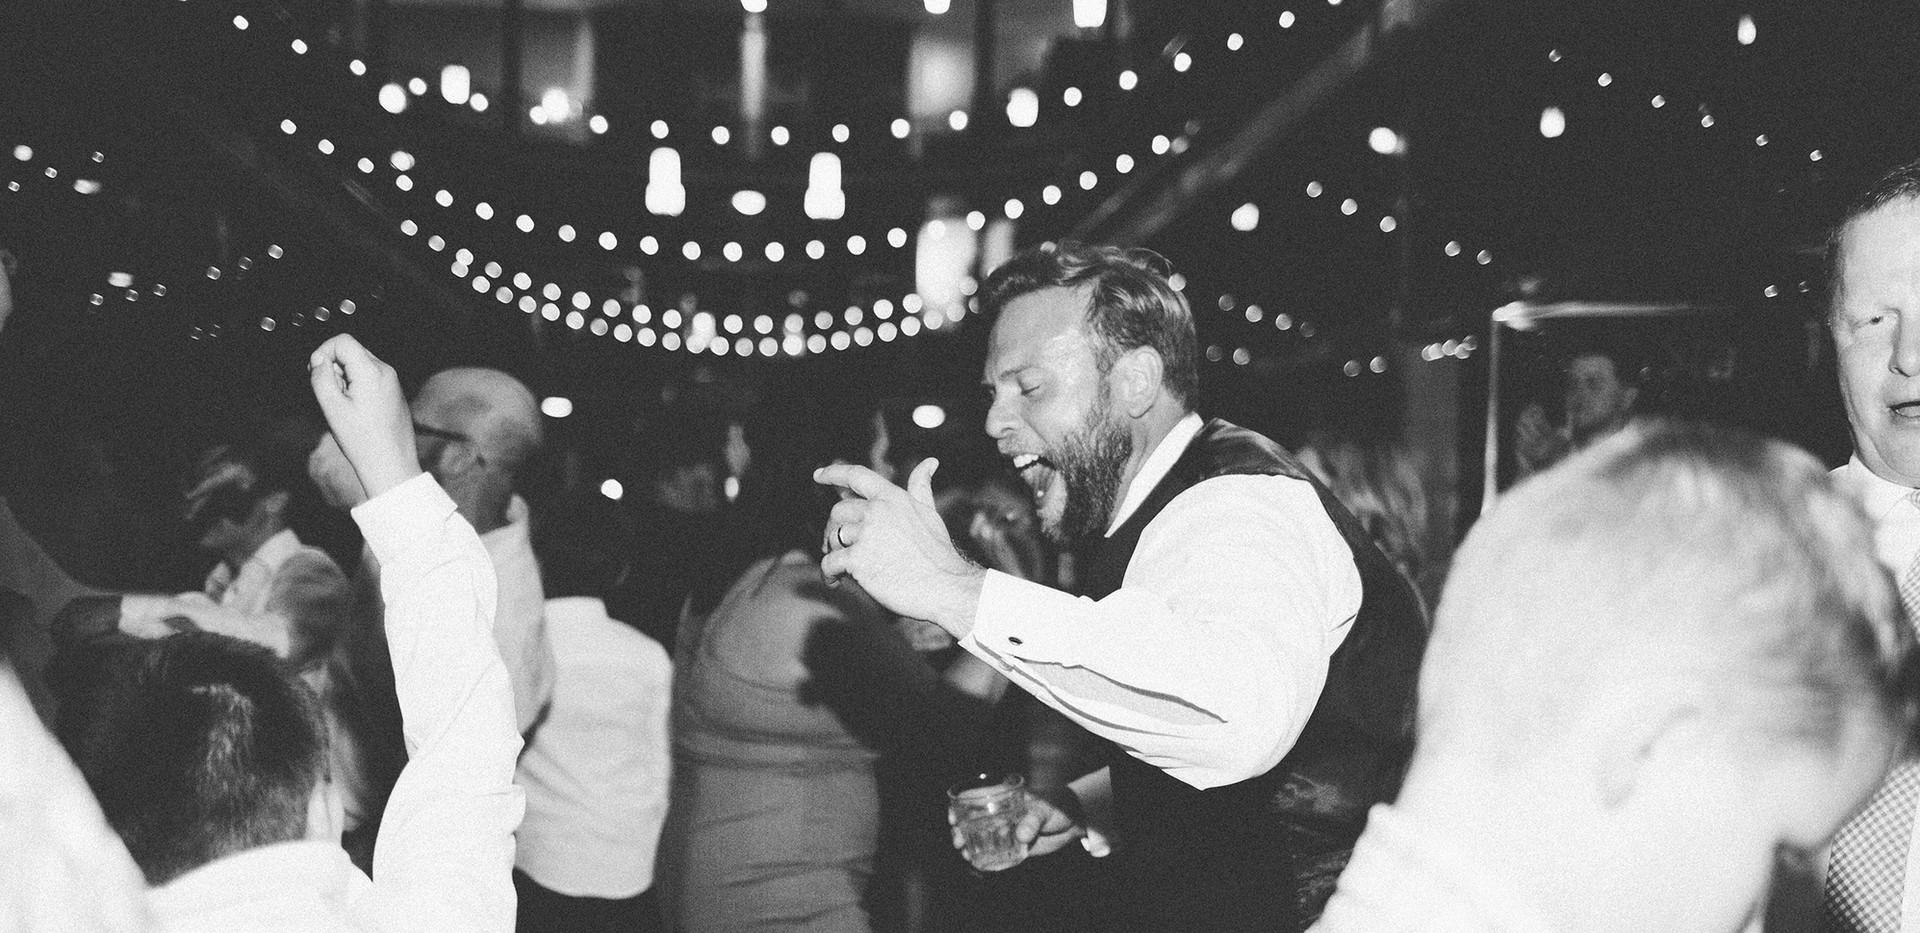 Mark & Ellen's Wedding at the Arcade with DJ Marcus Alan Ward.